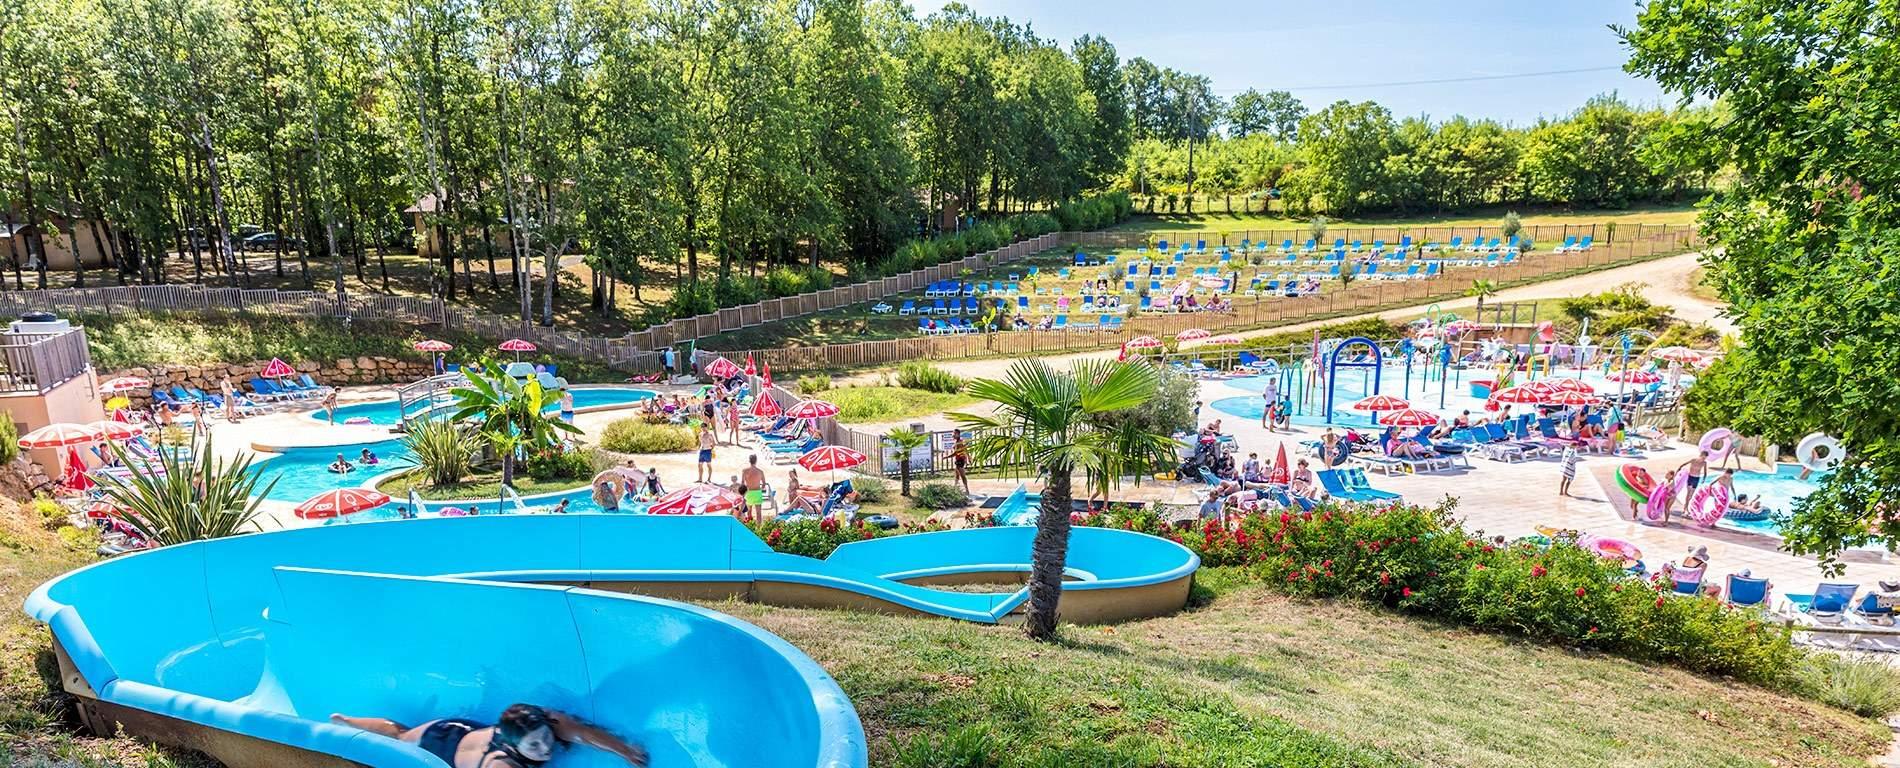 Camping Dordogne Avec Parc Aquatique 5 Étoiles | Saint Avit ... tout Camping Dordogne Avec Piscine Et Toboggan